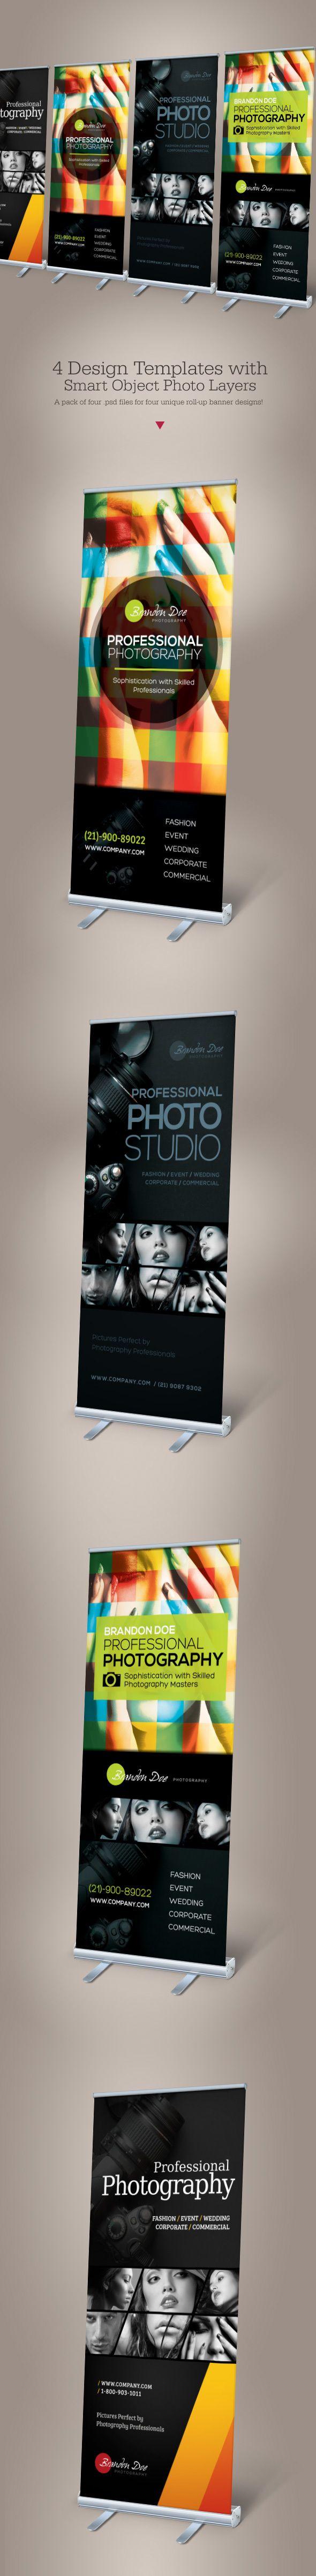 Photography Roll-up Banners by Kinzi Wijaya, via Behance